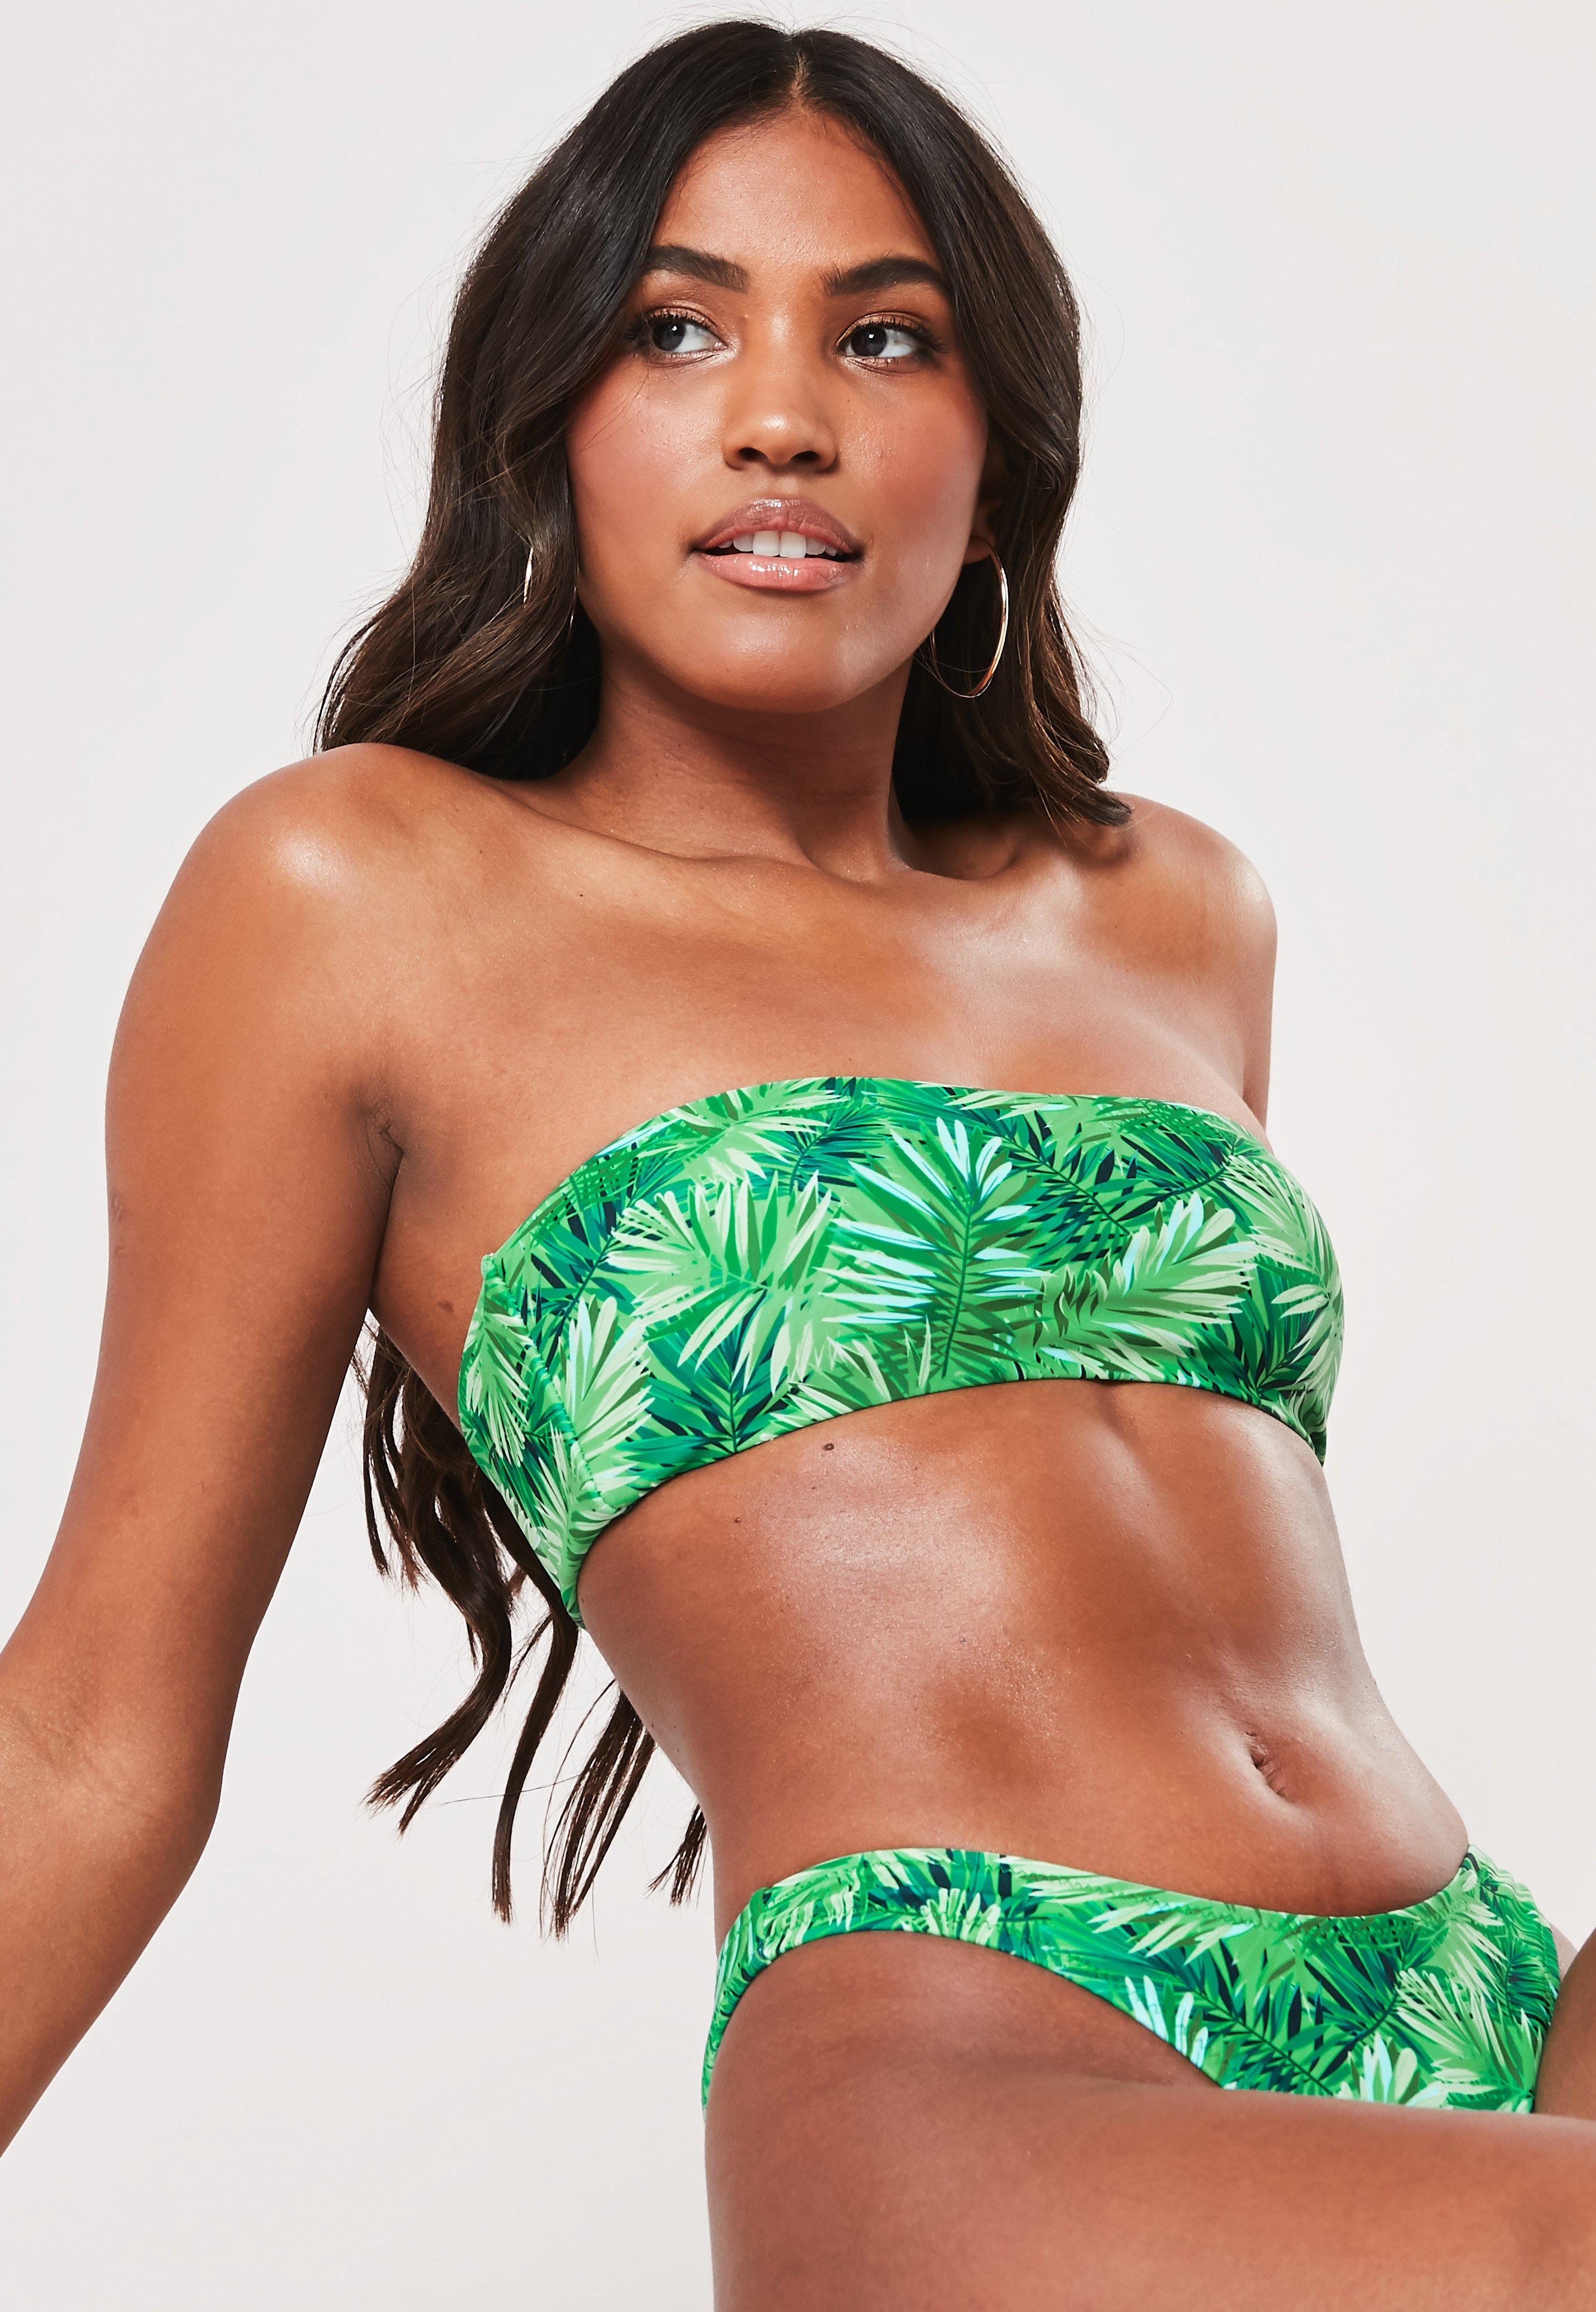 892b9f7a8c Swimwear and Beachwear for Women - Missguided